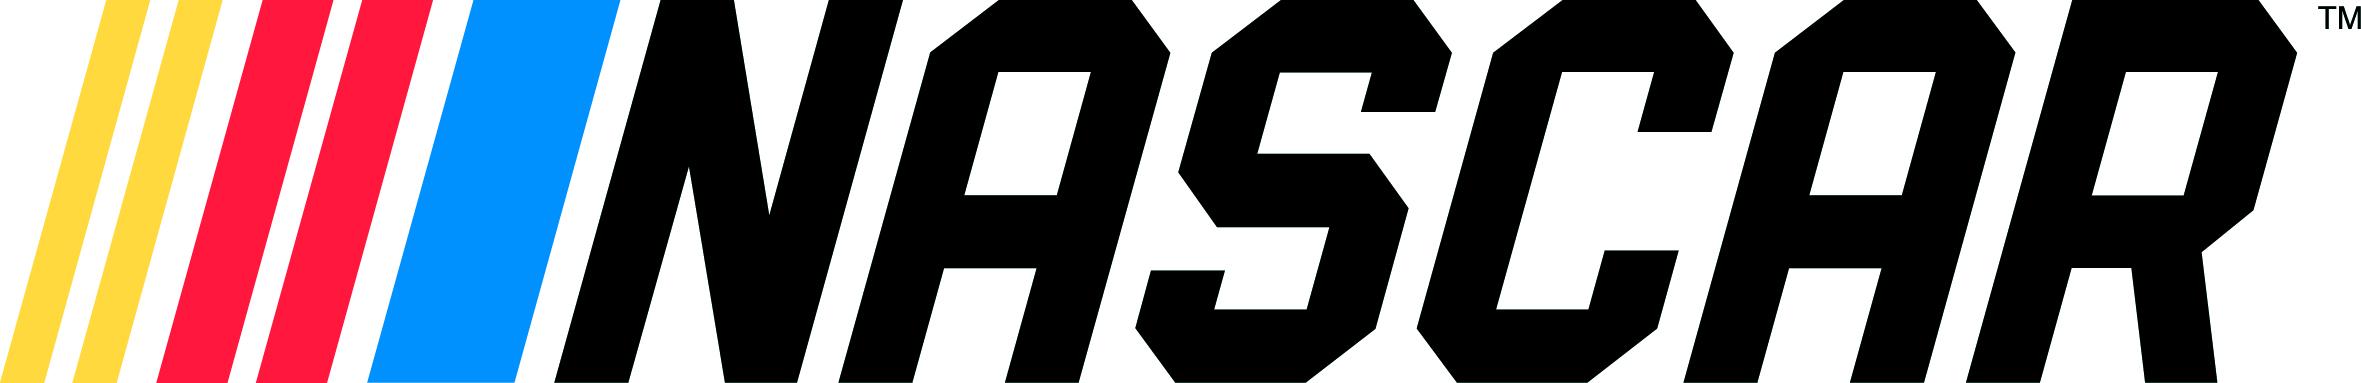 NASCAR_Primary_4C WHT BK_PRT